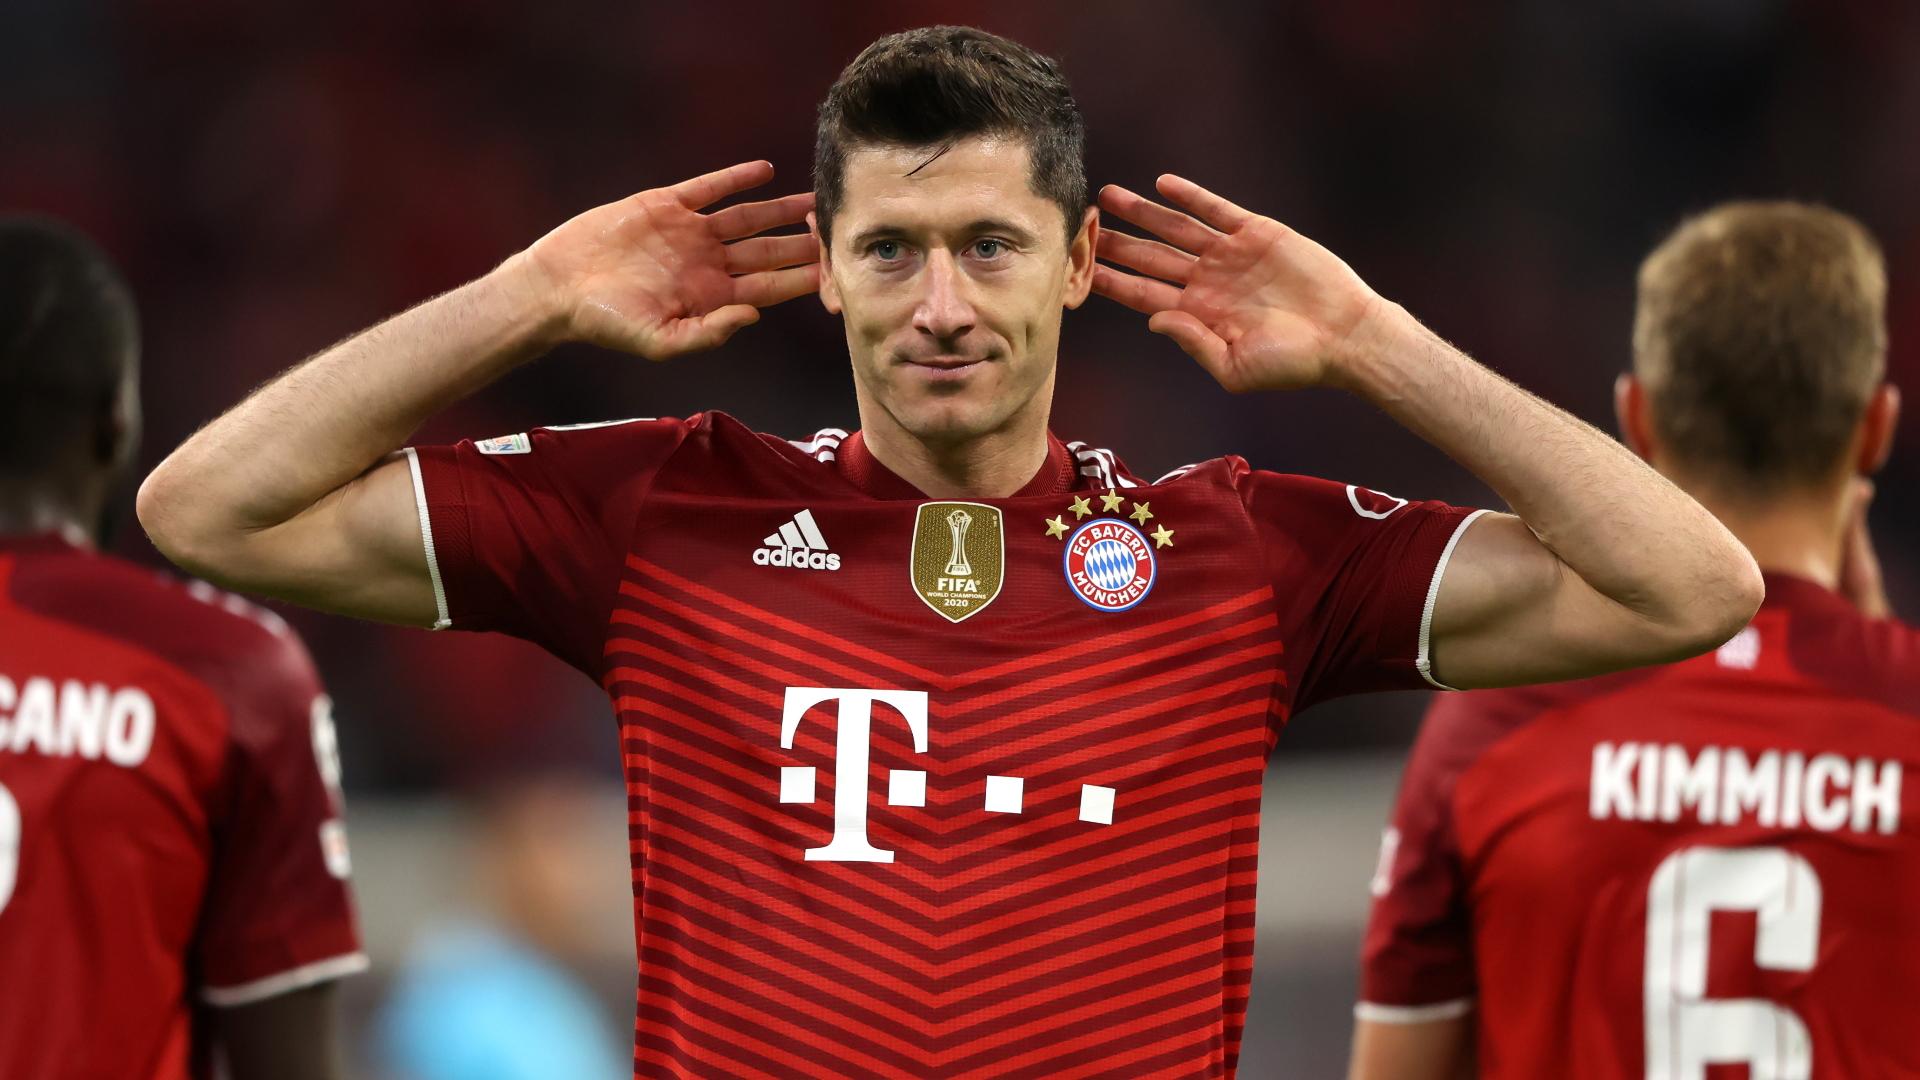 Bayern Munich star Lewandowski sets new Champions League record for longest winning streak